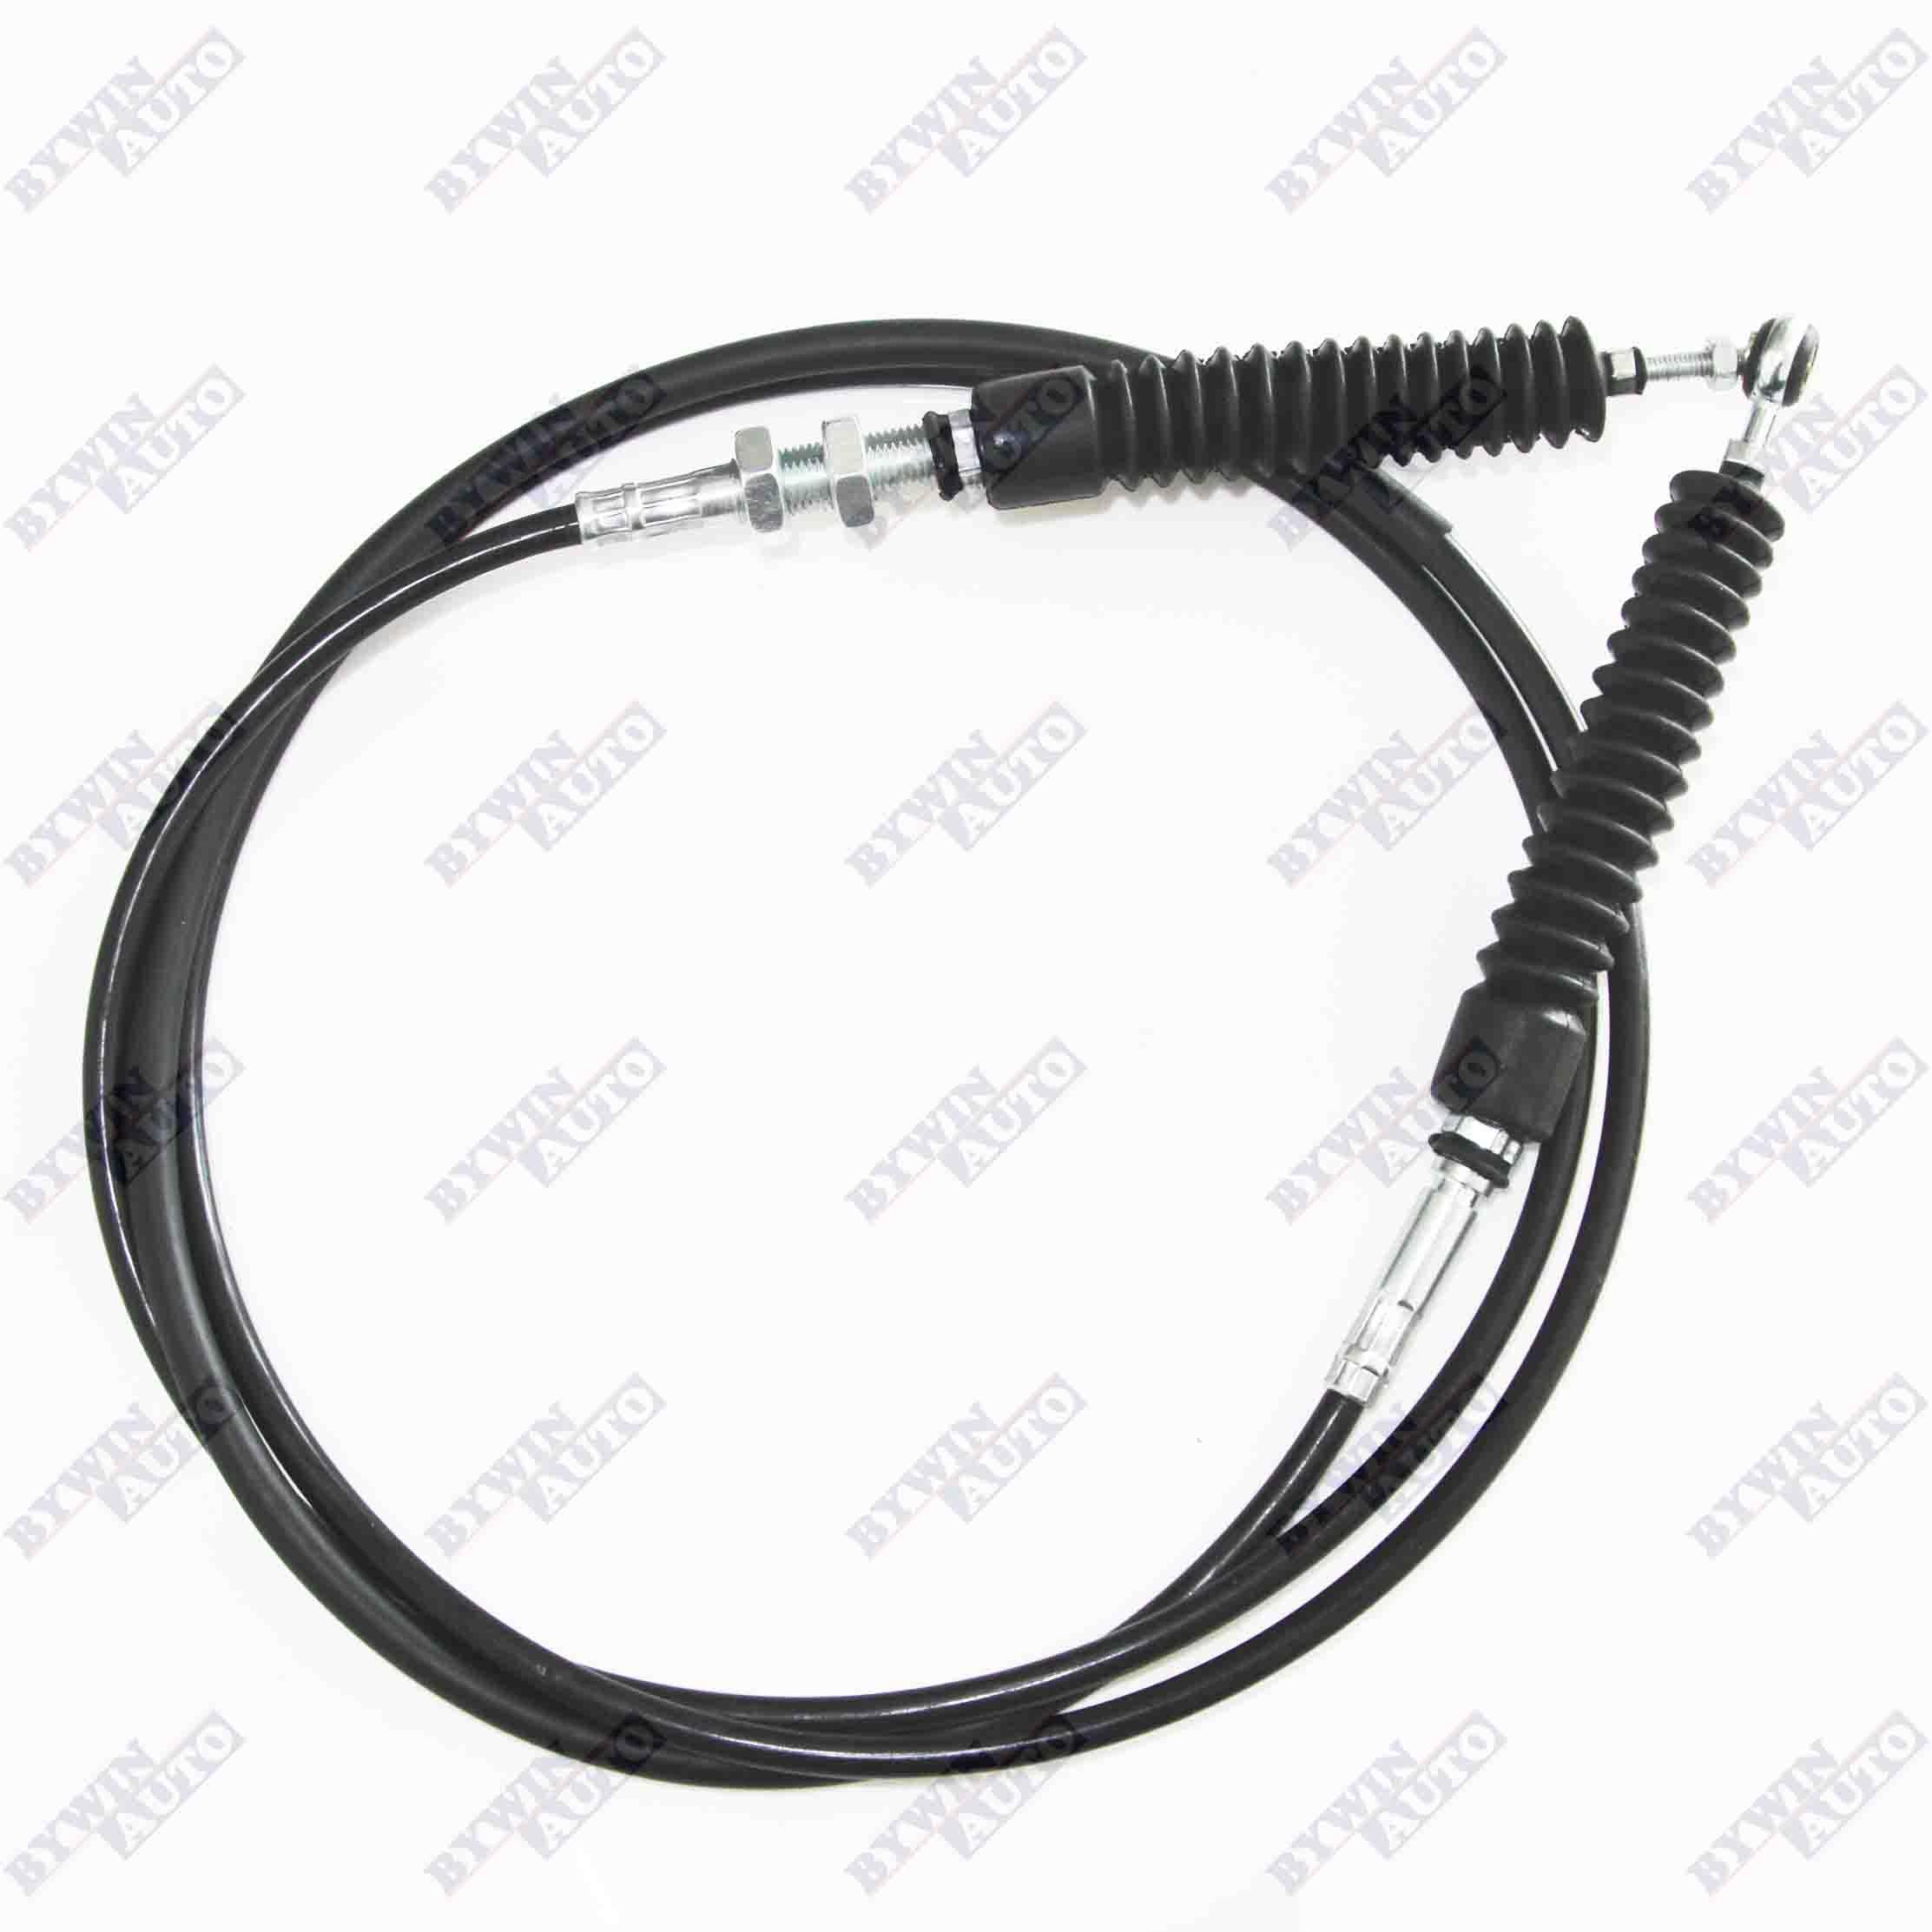 Shift Cable 54010-1089 Fits Kawasaki Mule 2500 2510 2520 Forward Reverse 93-02